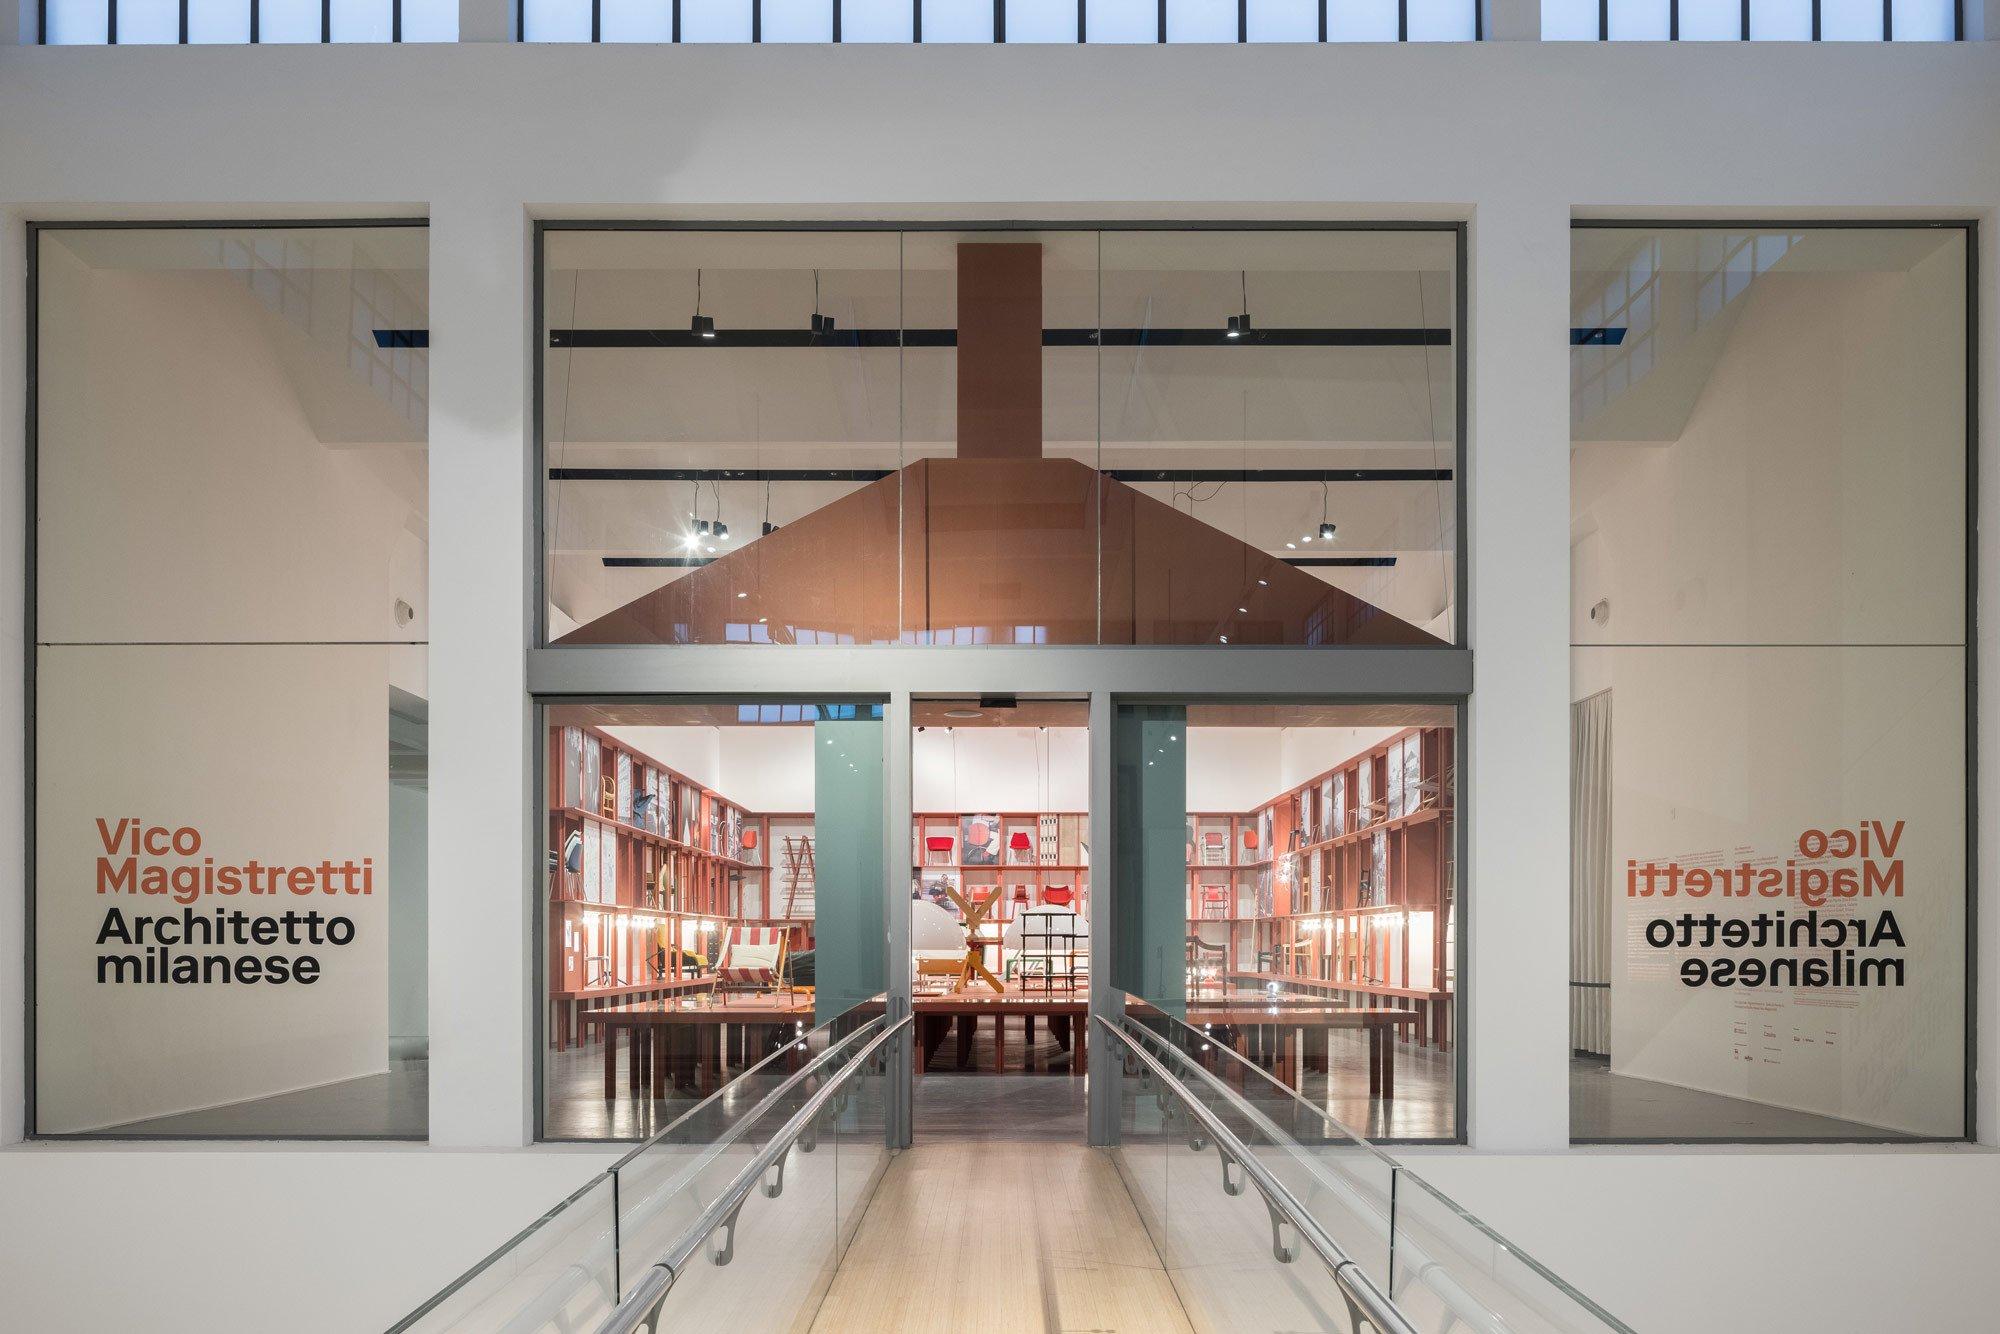 Retrospektive in der Triennale Milano